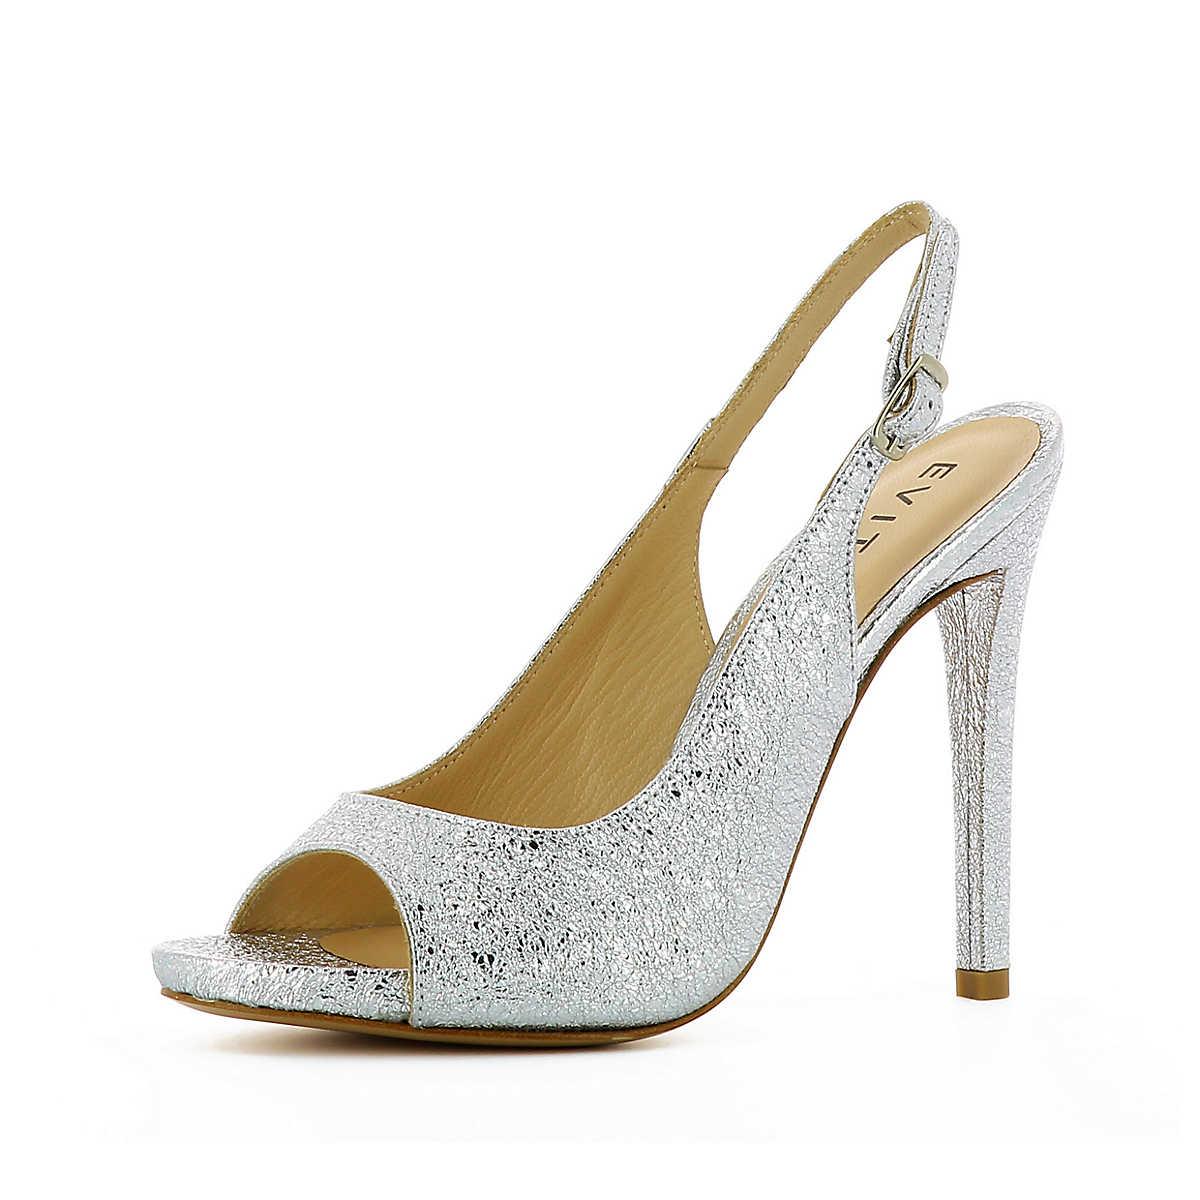 Evita Shoes Pumps silber - Evita Shoes - Pumps - Schuhe - mirapodo.de